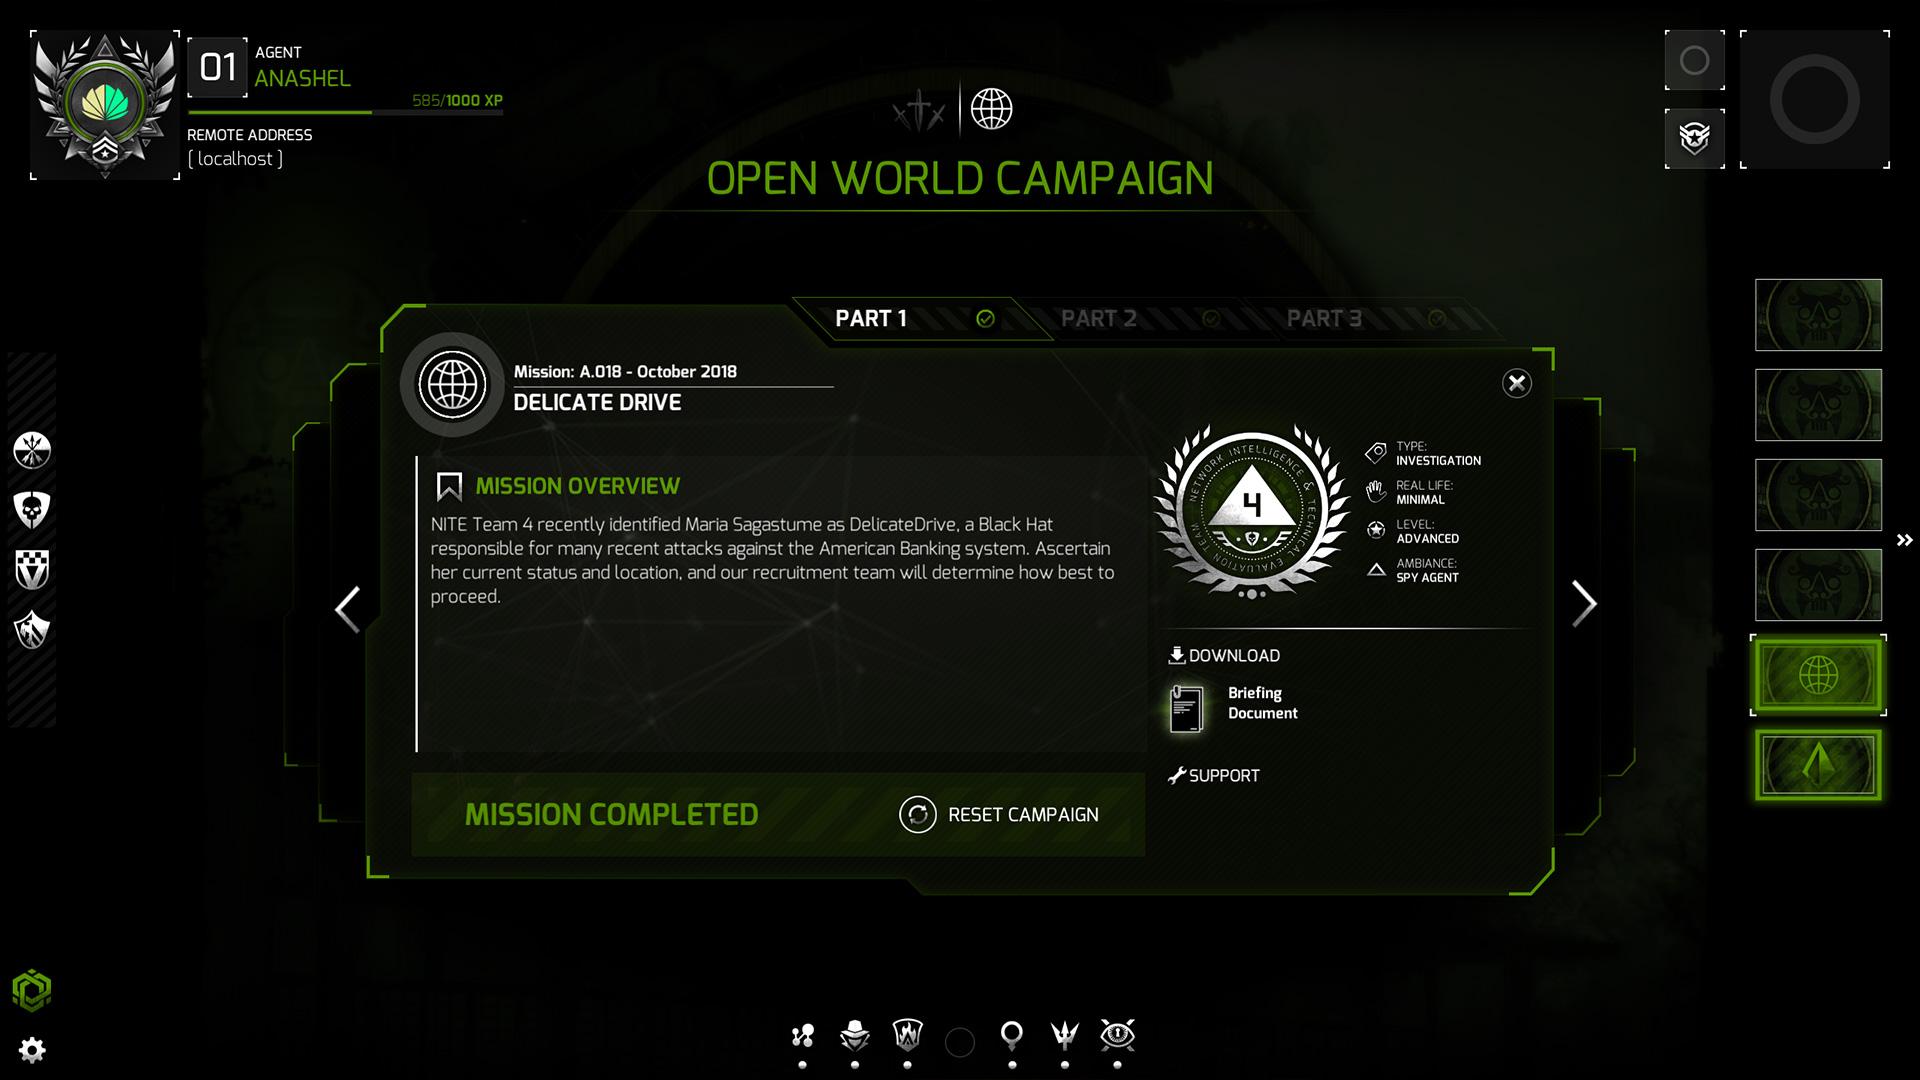 NITE Team 4 - Military Hacking Division Fiyat Karşılaştırma